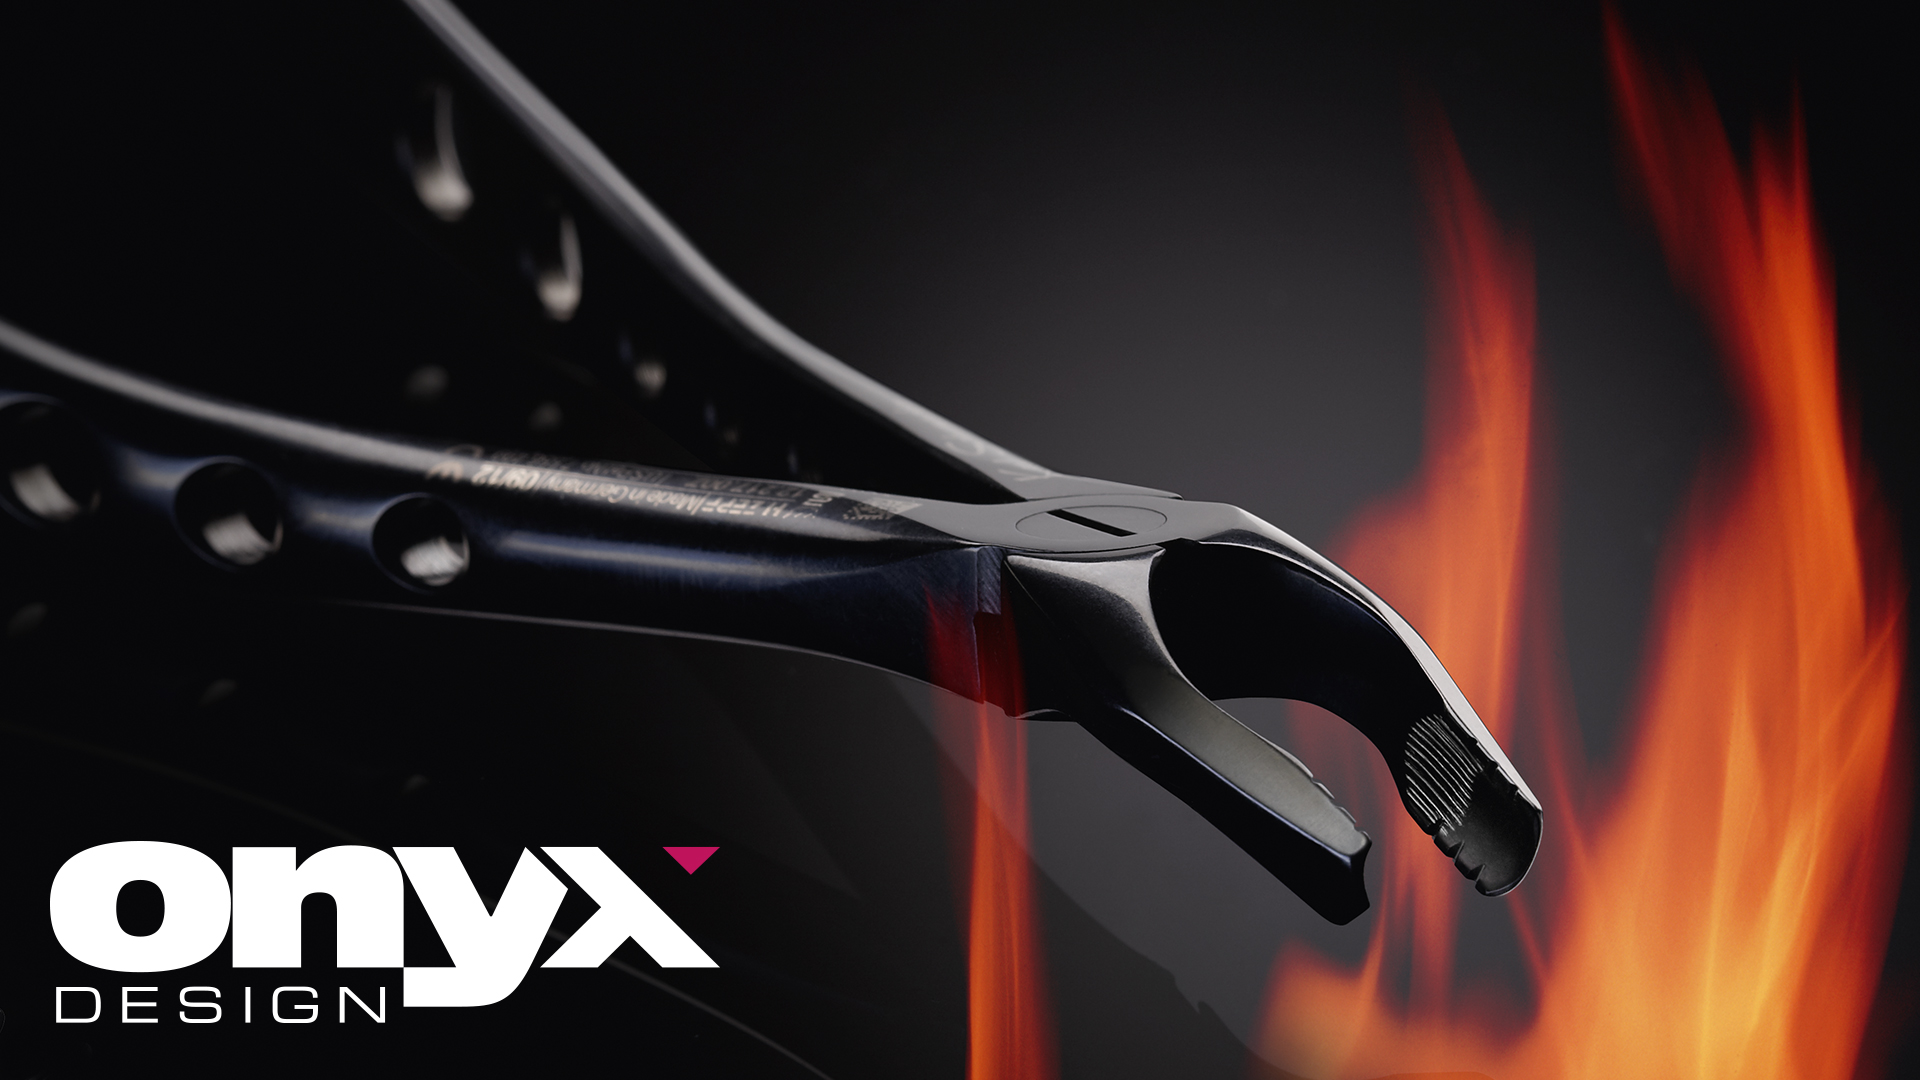 onyxdesign-zepf